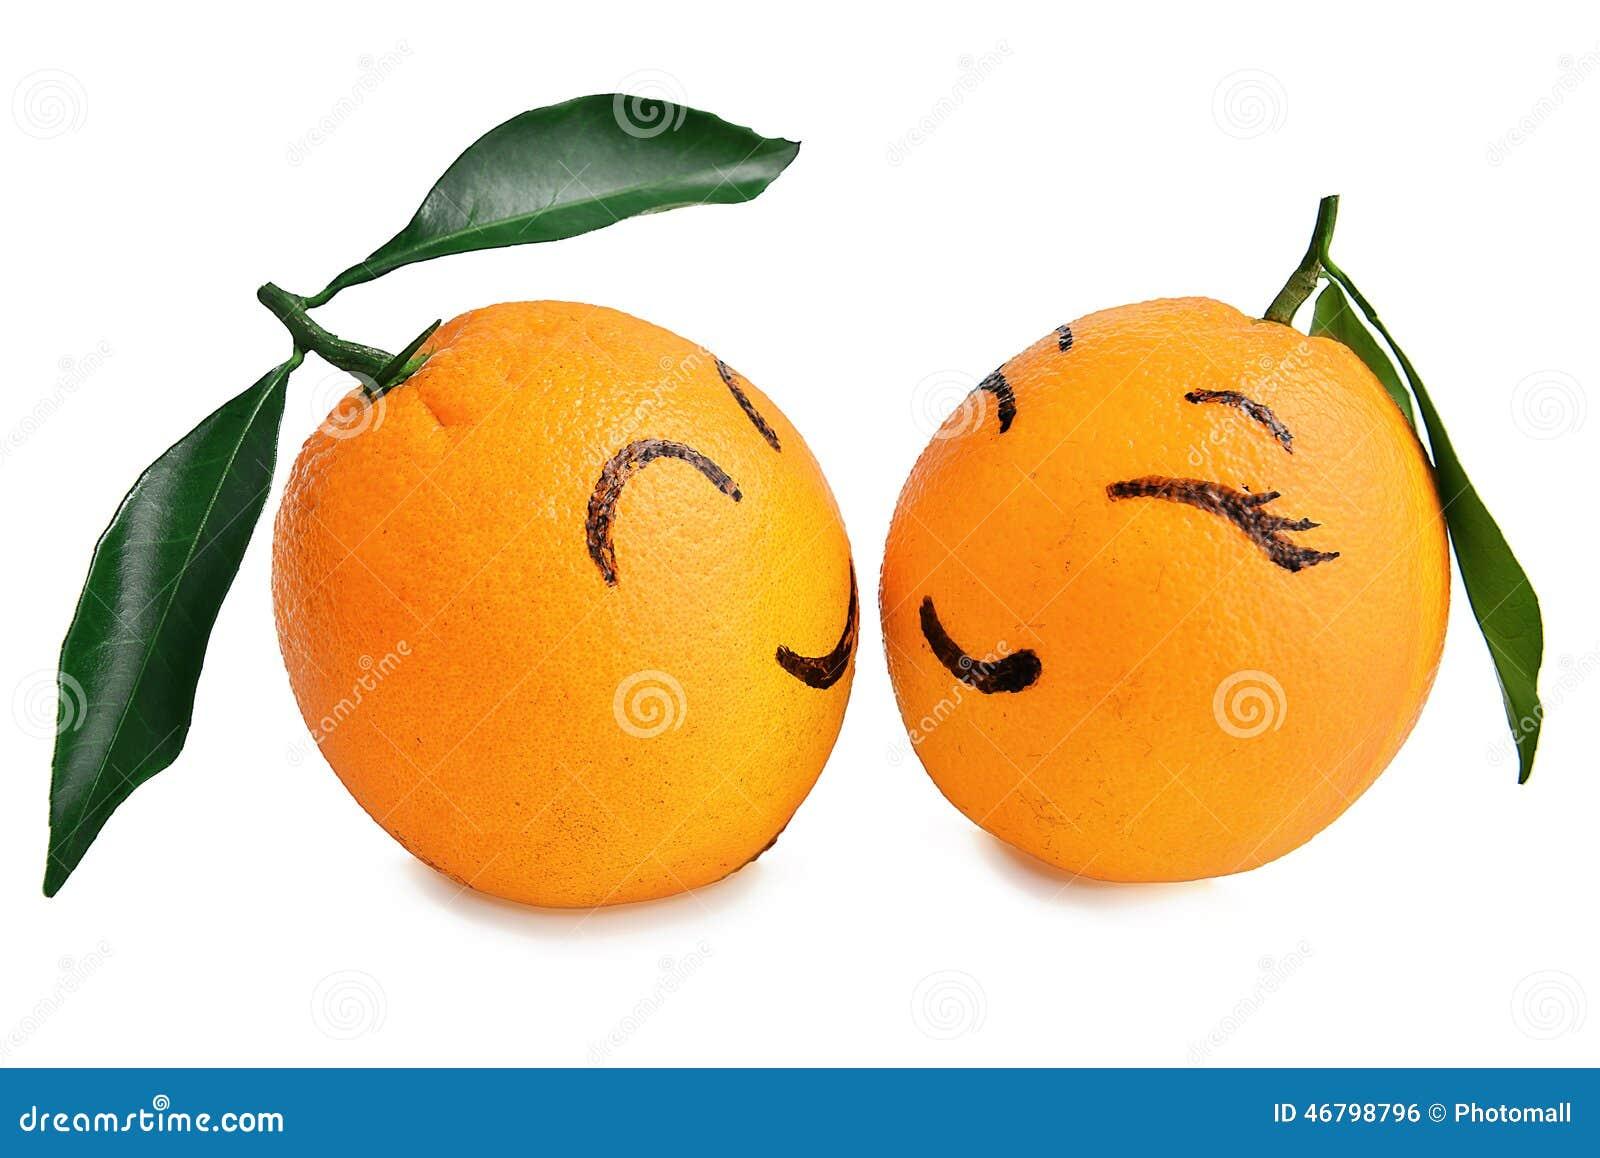 Fresh orange Expression of Lovers Cartoon, Creative Poster, Valentine Valentines marriage married marry wedding